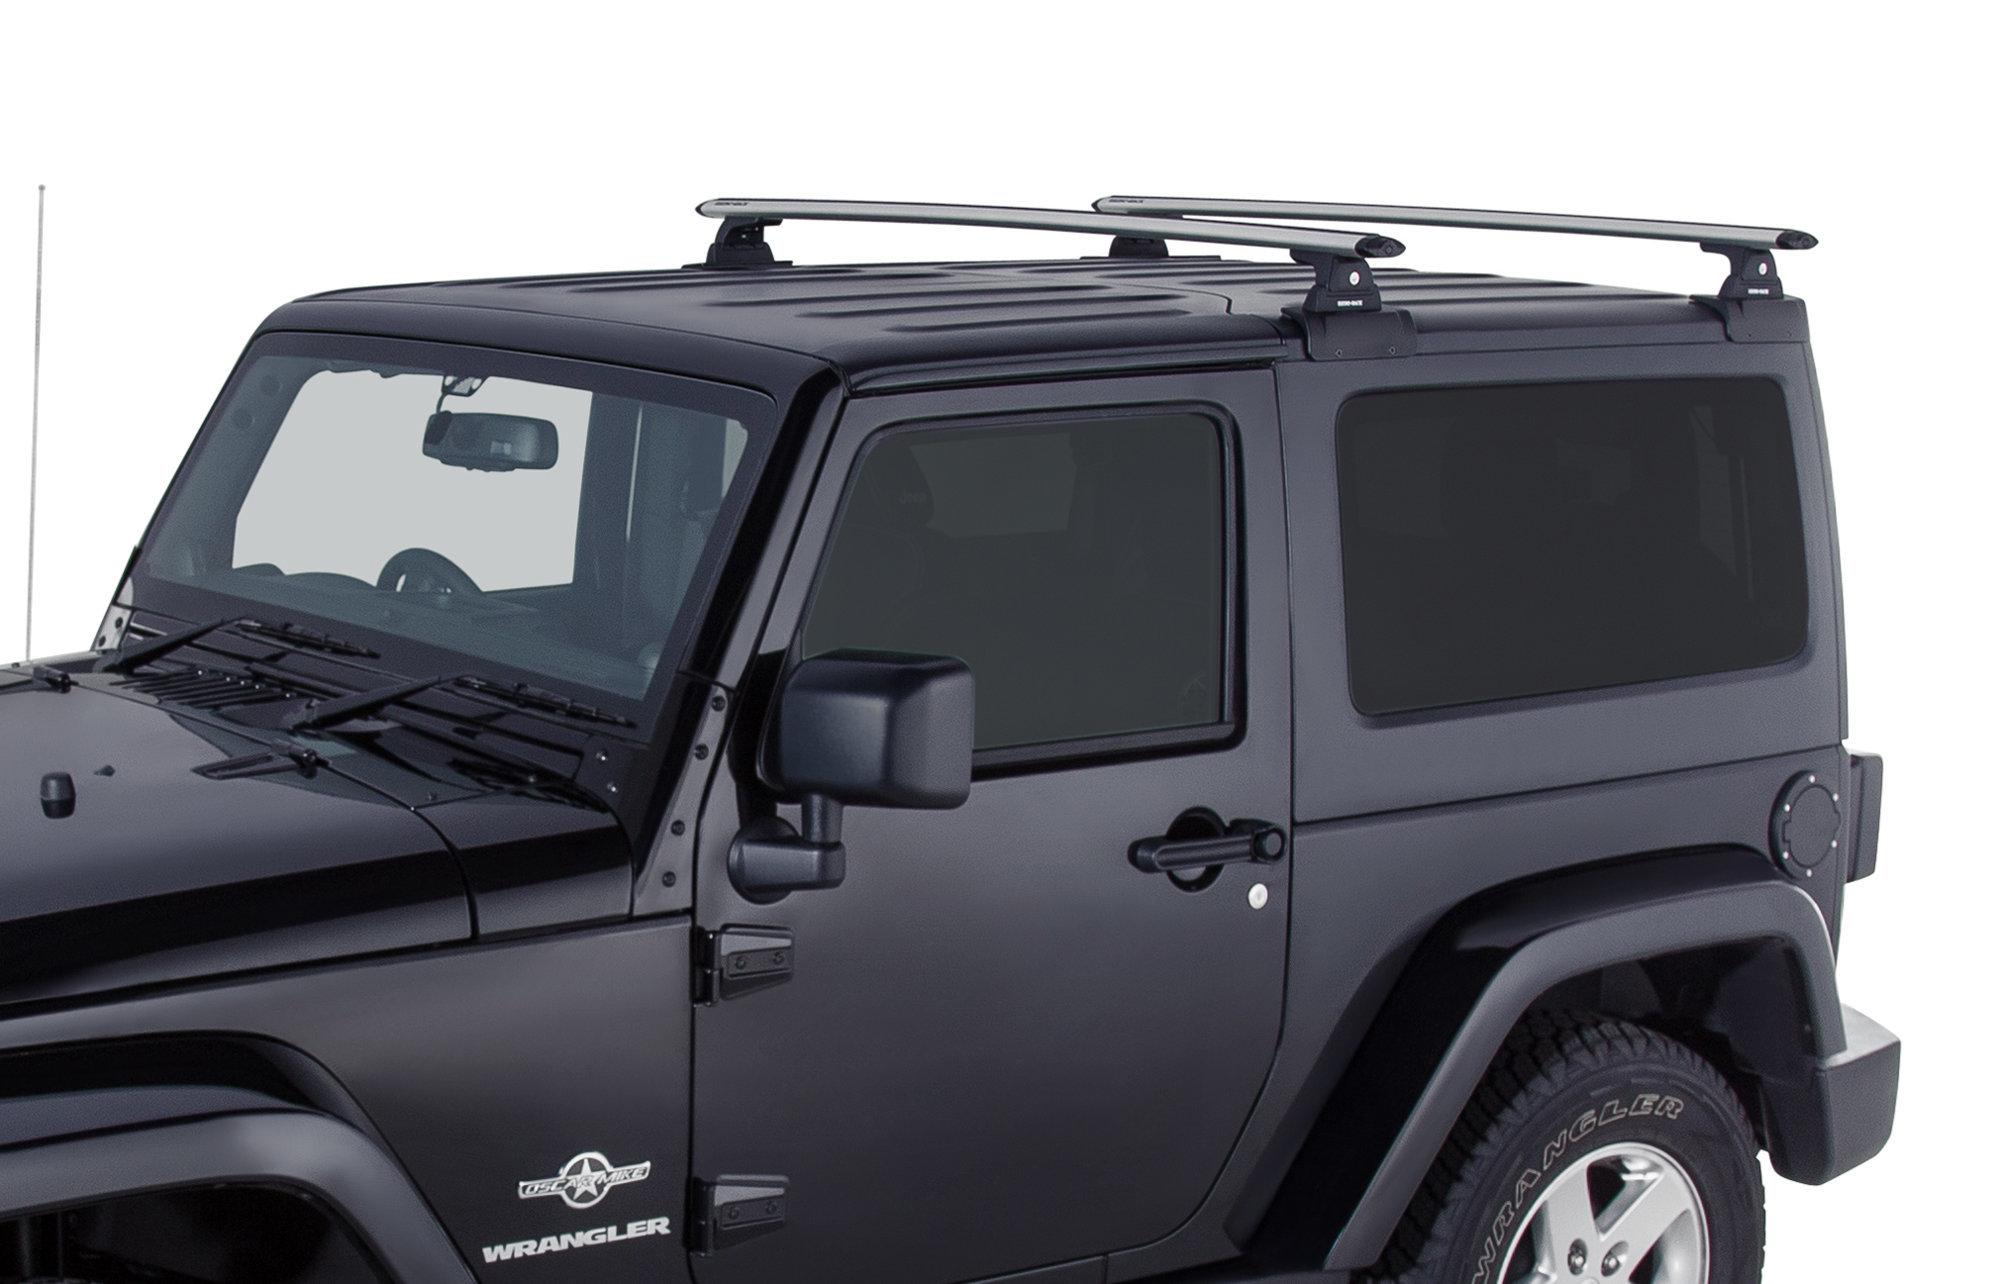 rhino rack vortex 2 bar backbone roof rack for 07 18 jeep wrangler jk hardtop